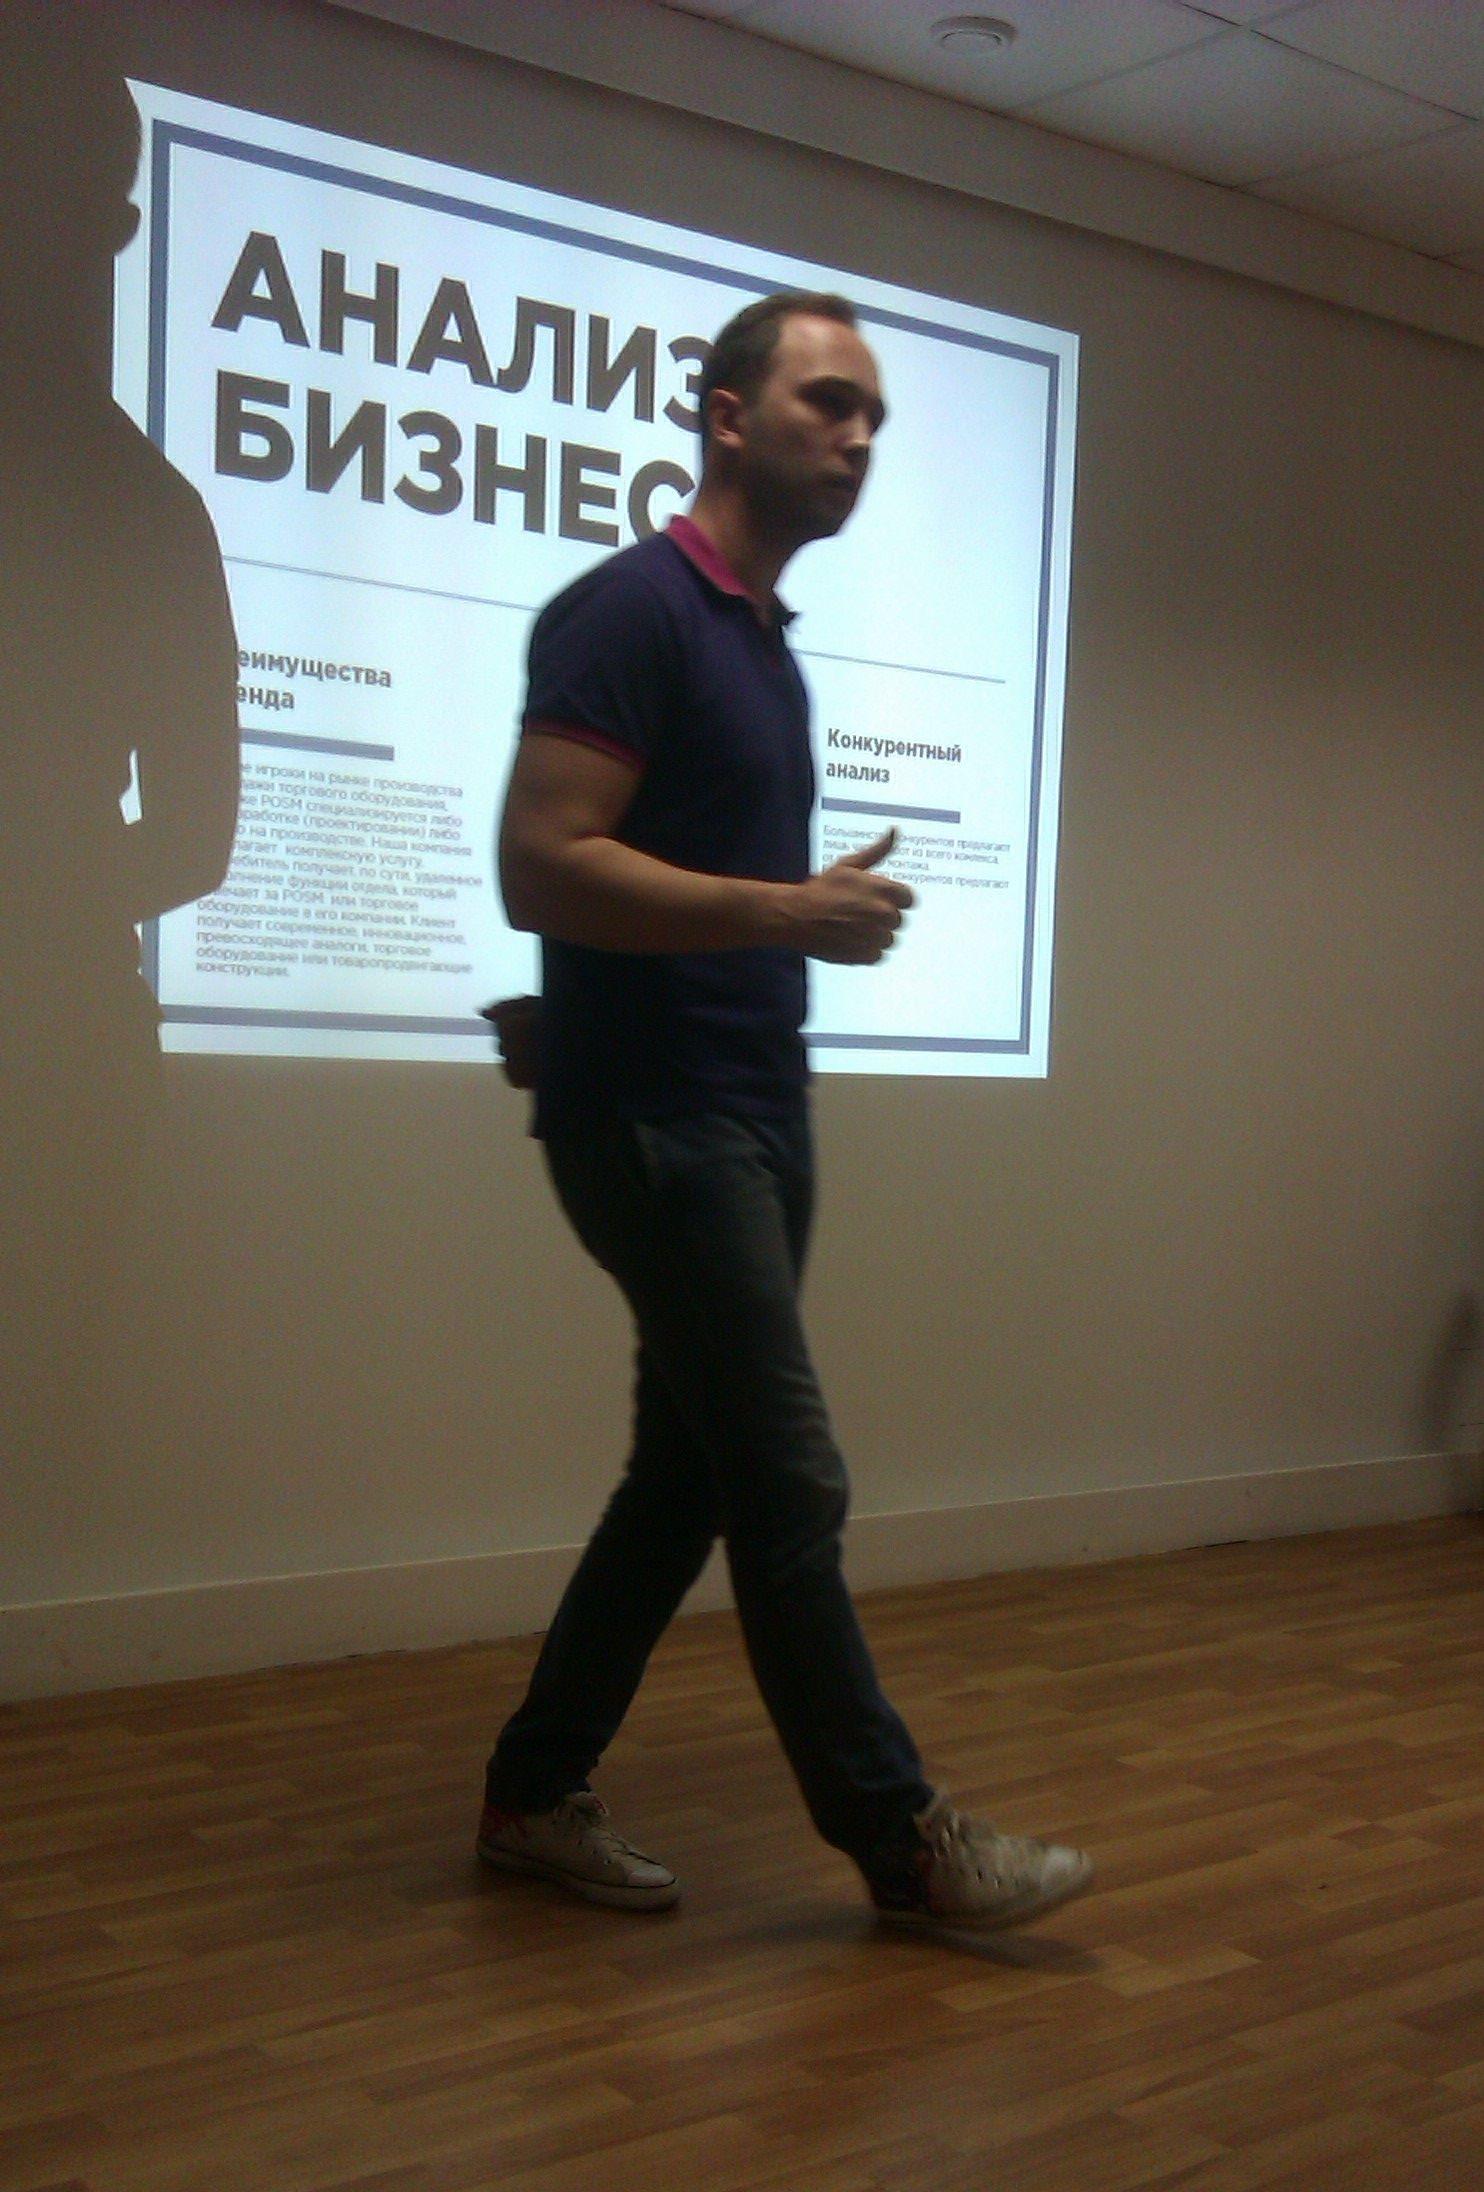 Дмитрий Крутов